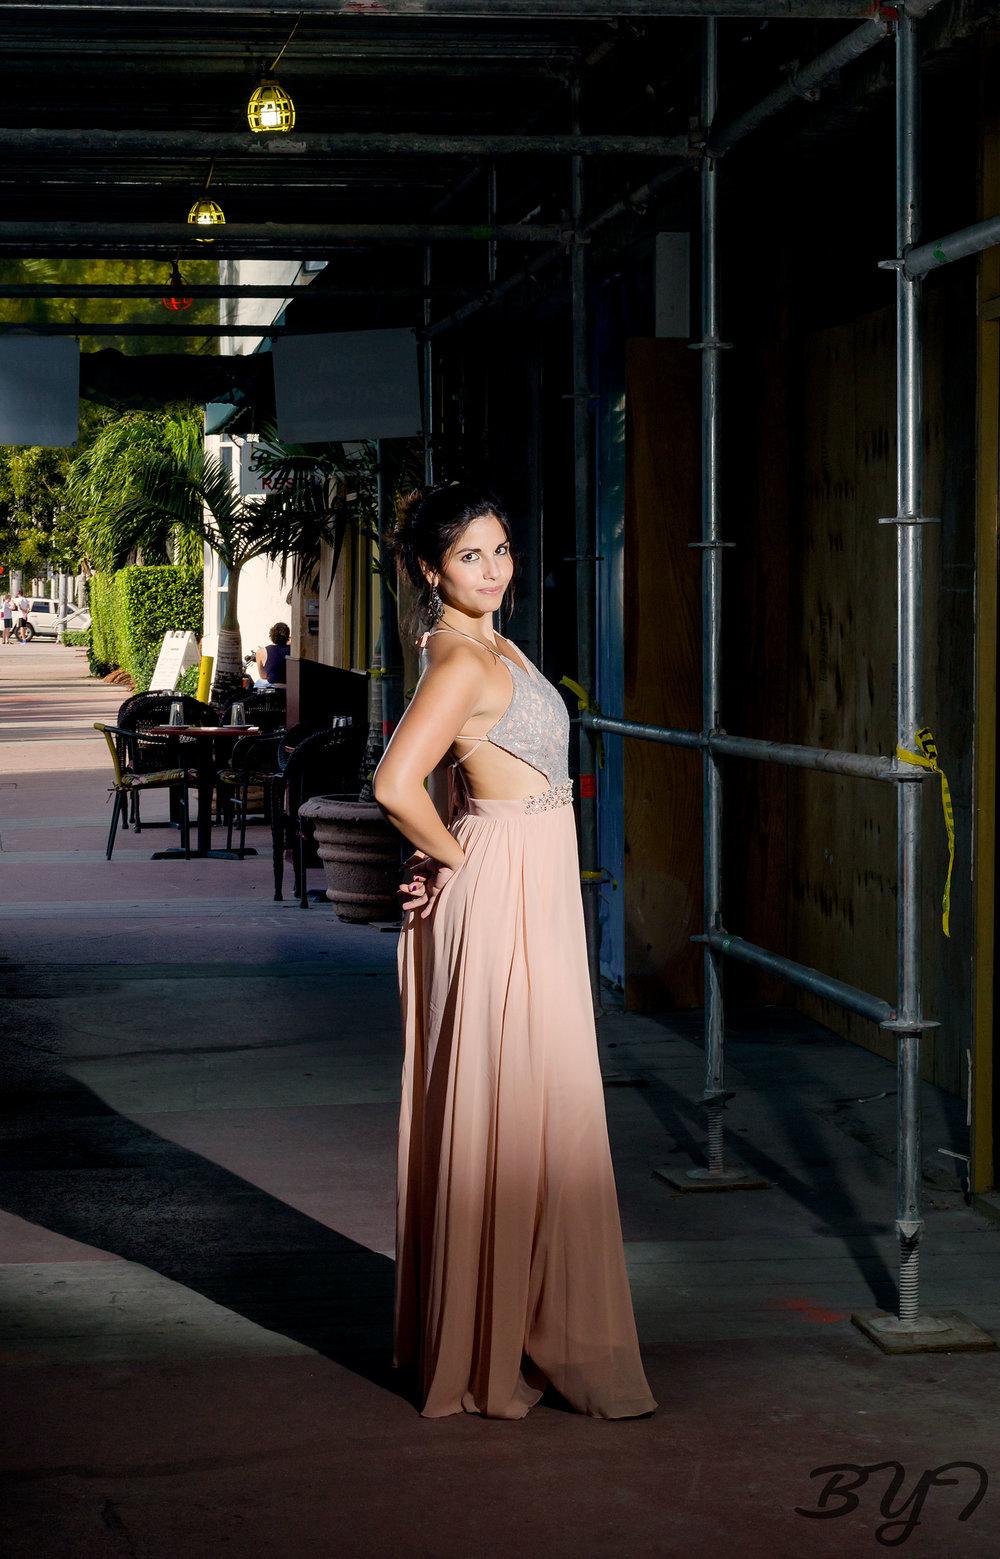 Model: Linda Espada Location: South Beach